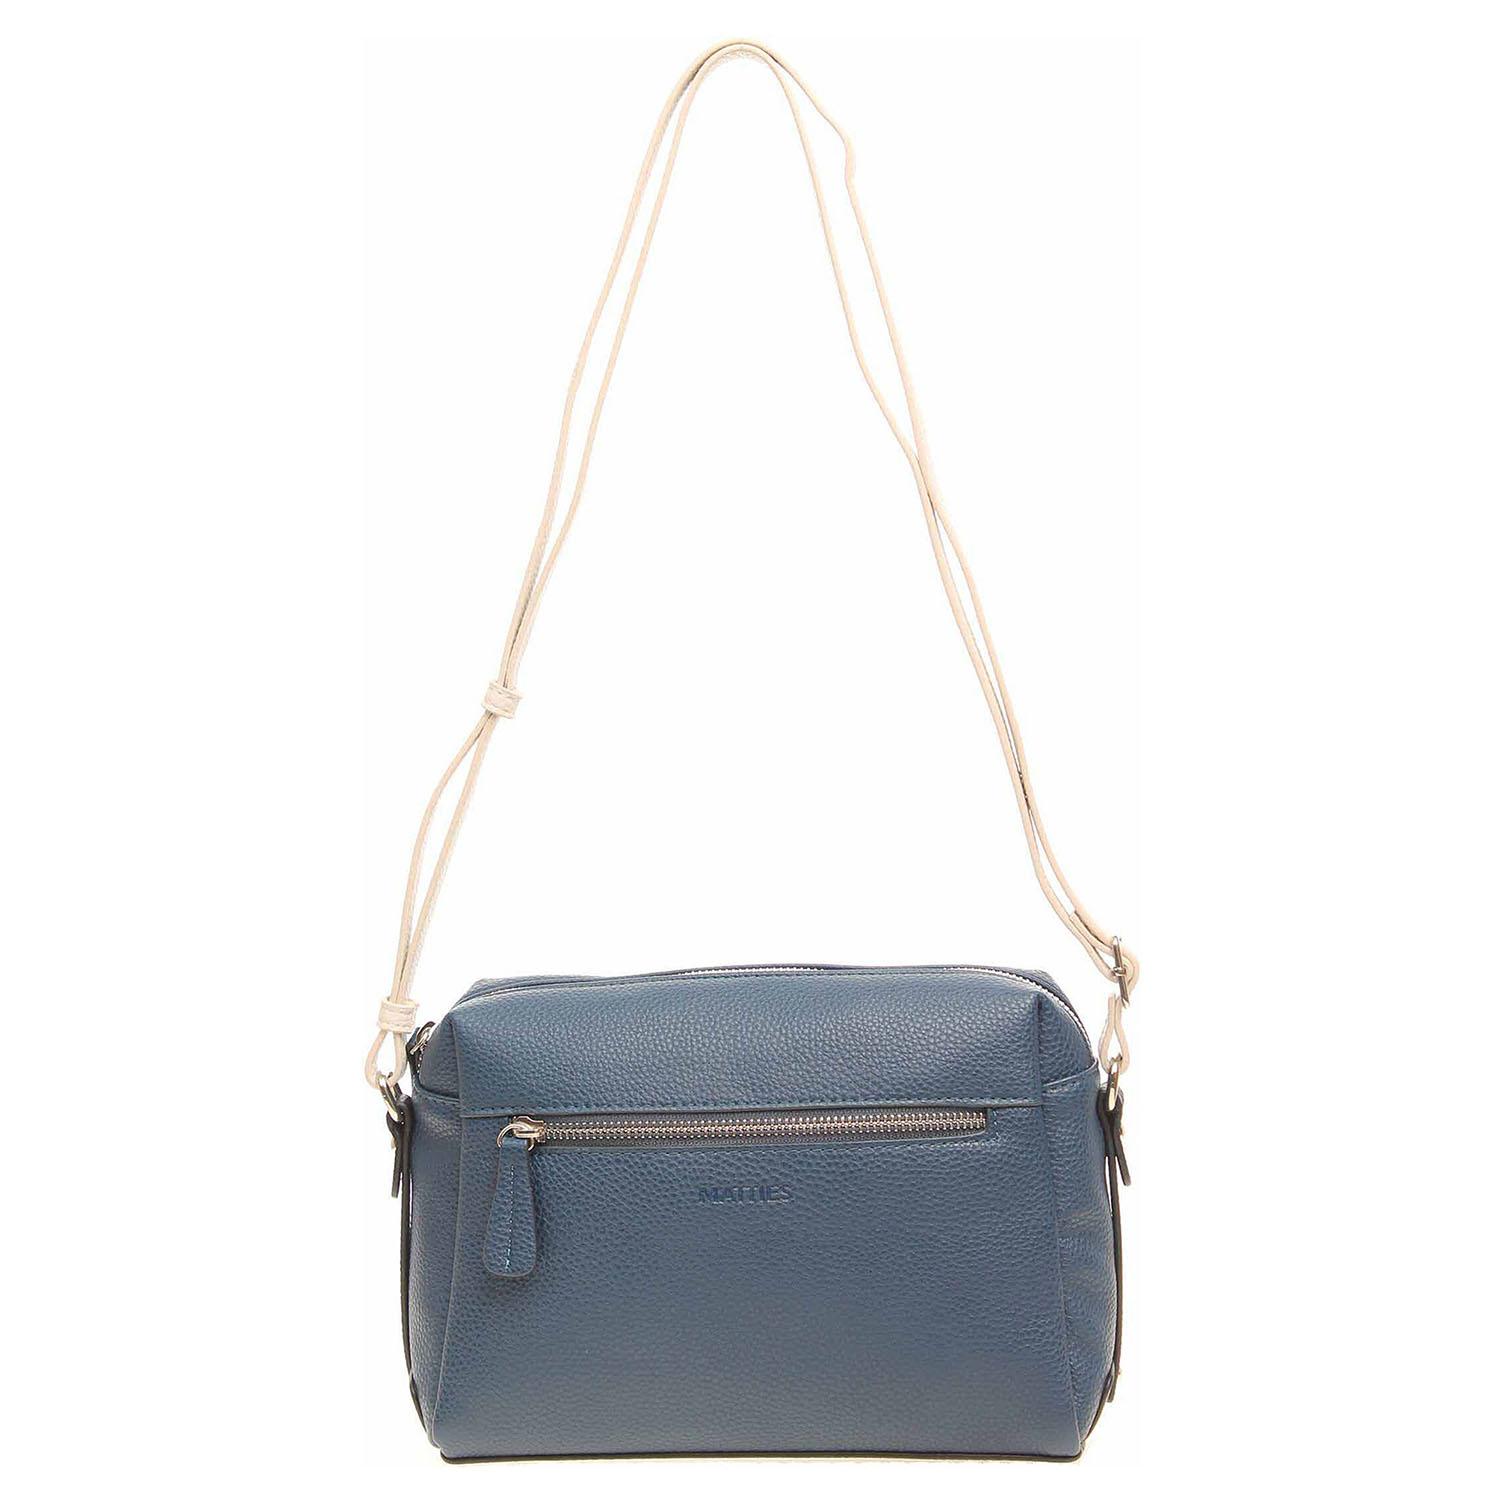 Ecco Matties dámská kabelka 9023 blue 11891409